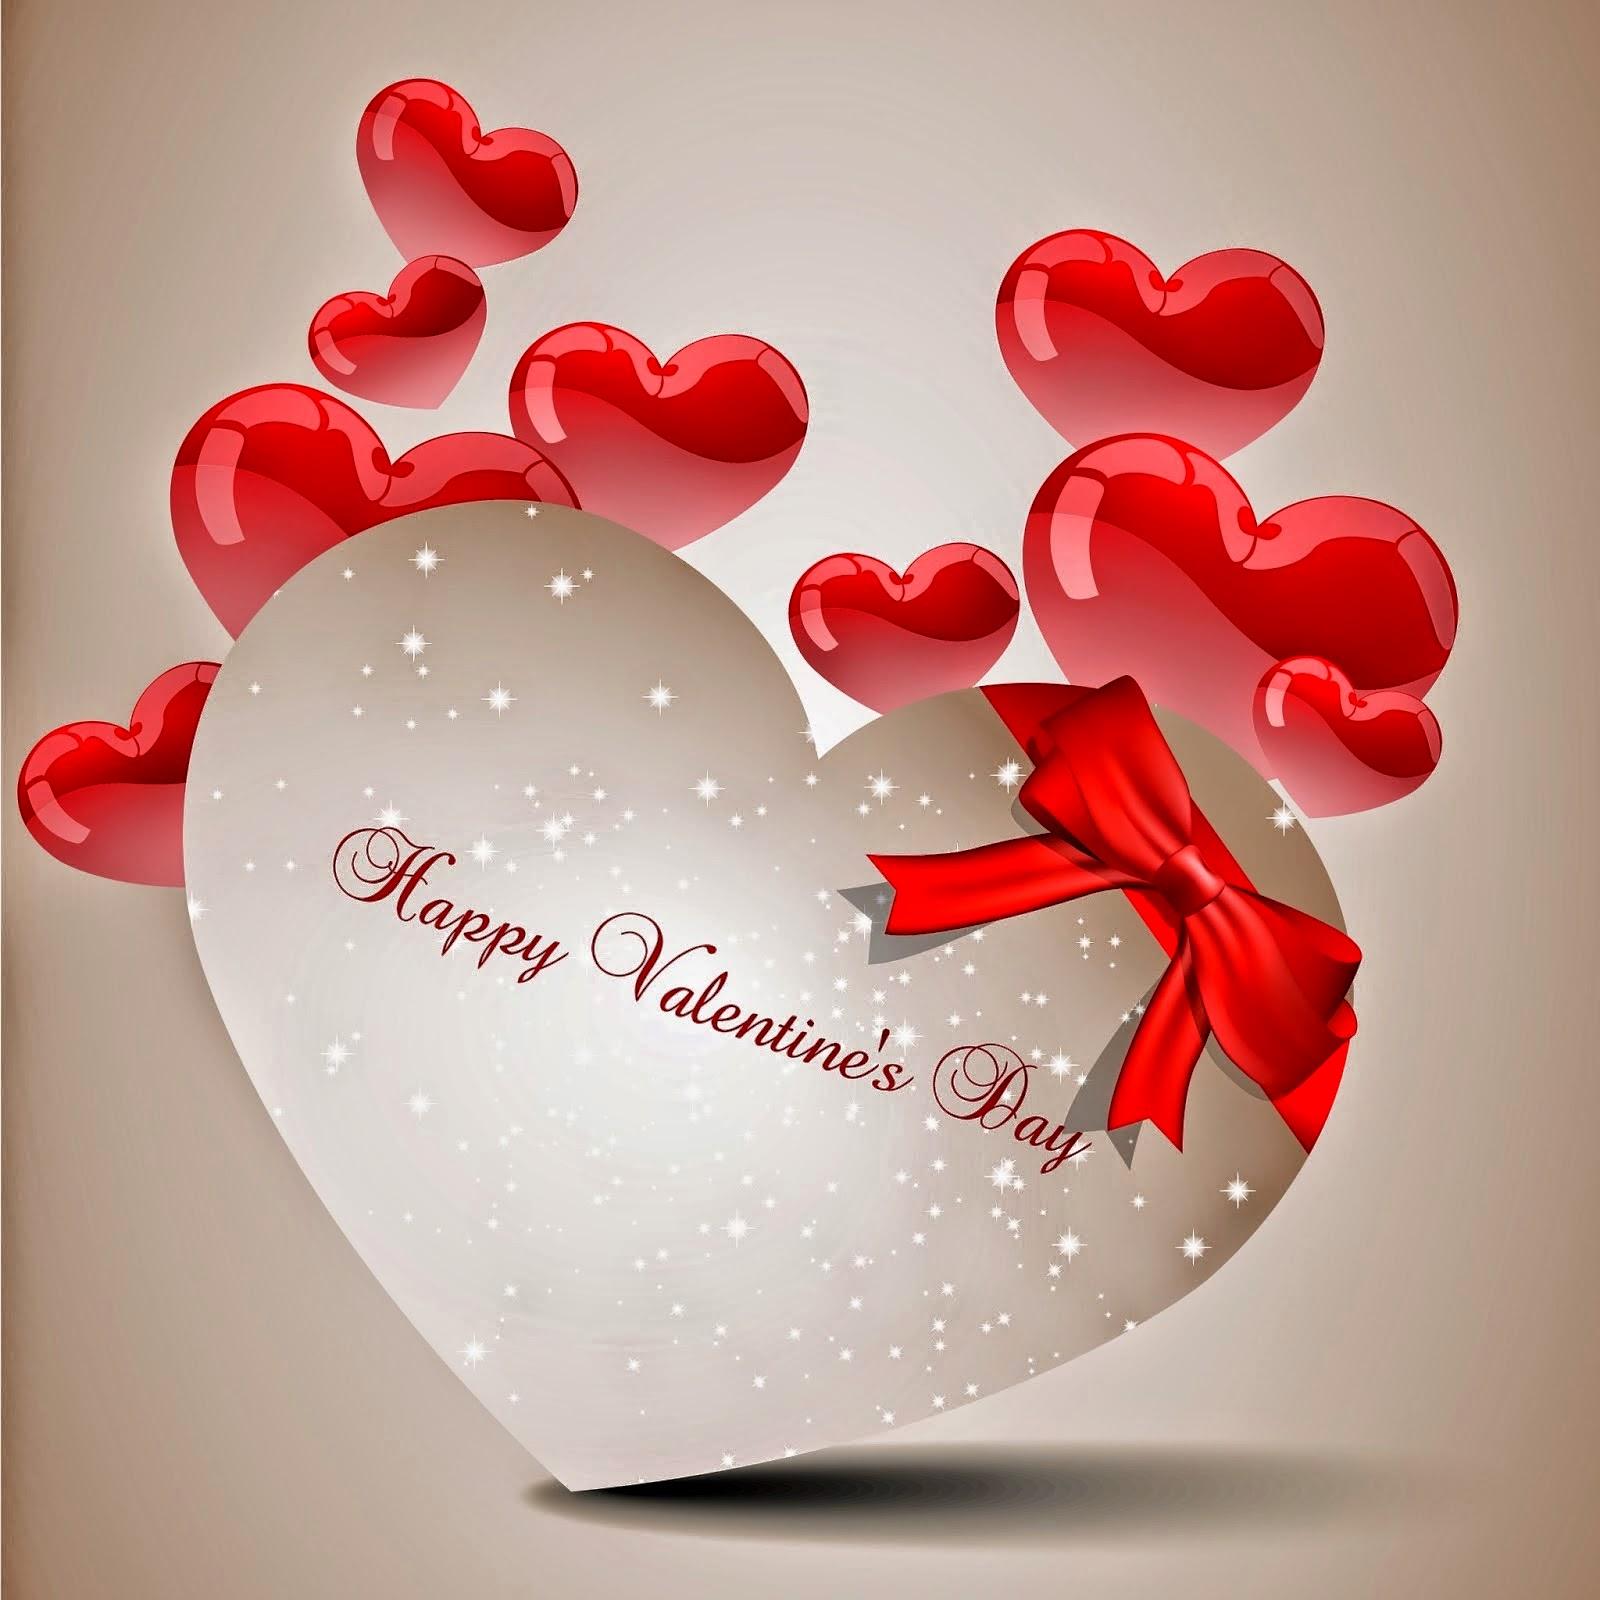 Happy Valentines Day 2015 Wallpaper images HD Happy Valentine – Valentines Cards 2015